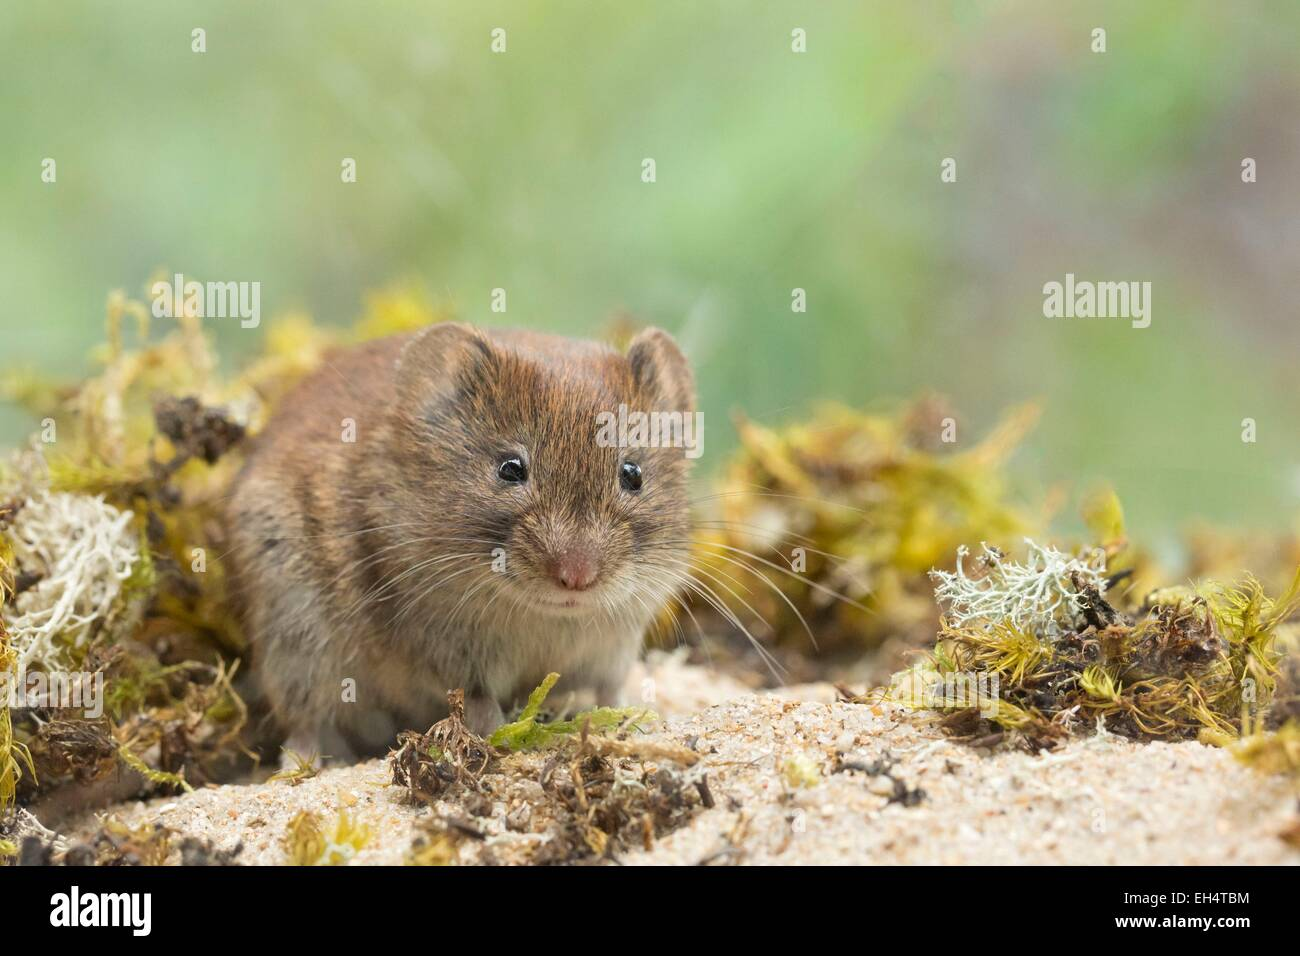 France, Vendee, Saint Jean de Monts, Bank vole, (Clethrionomys glareolus) - Stock Image